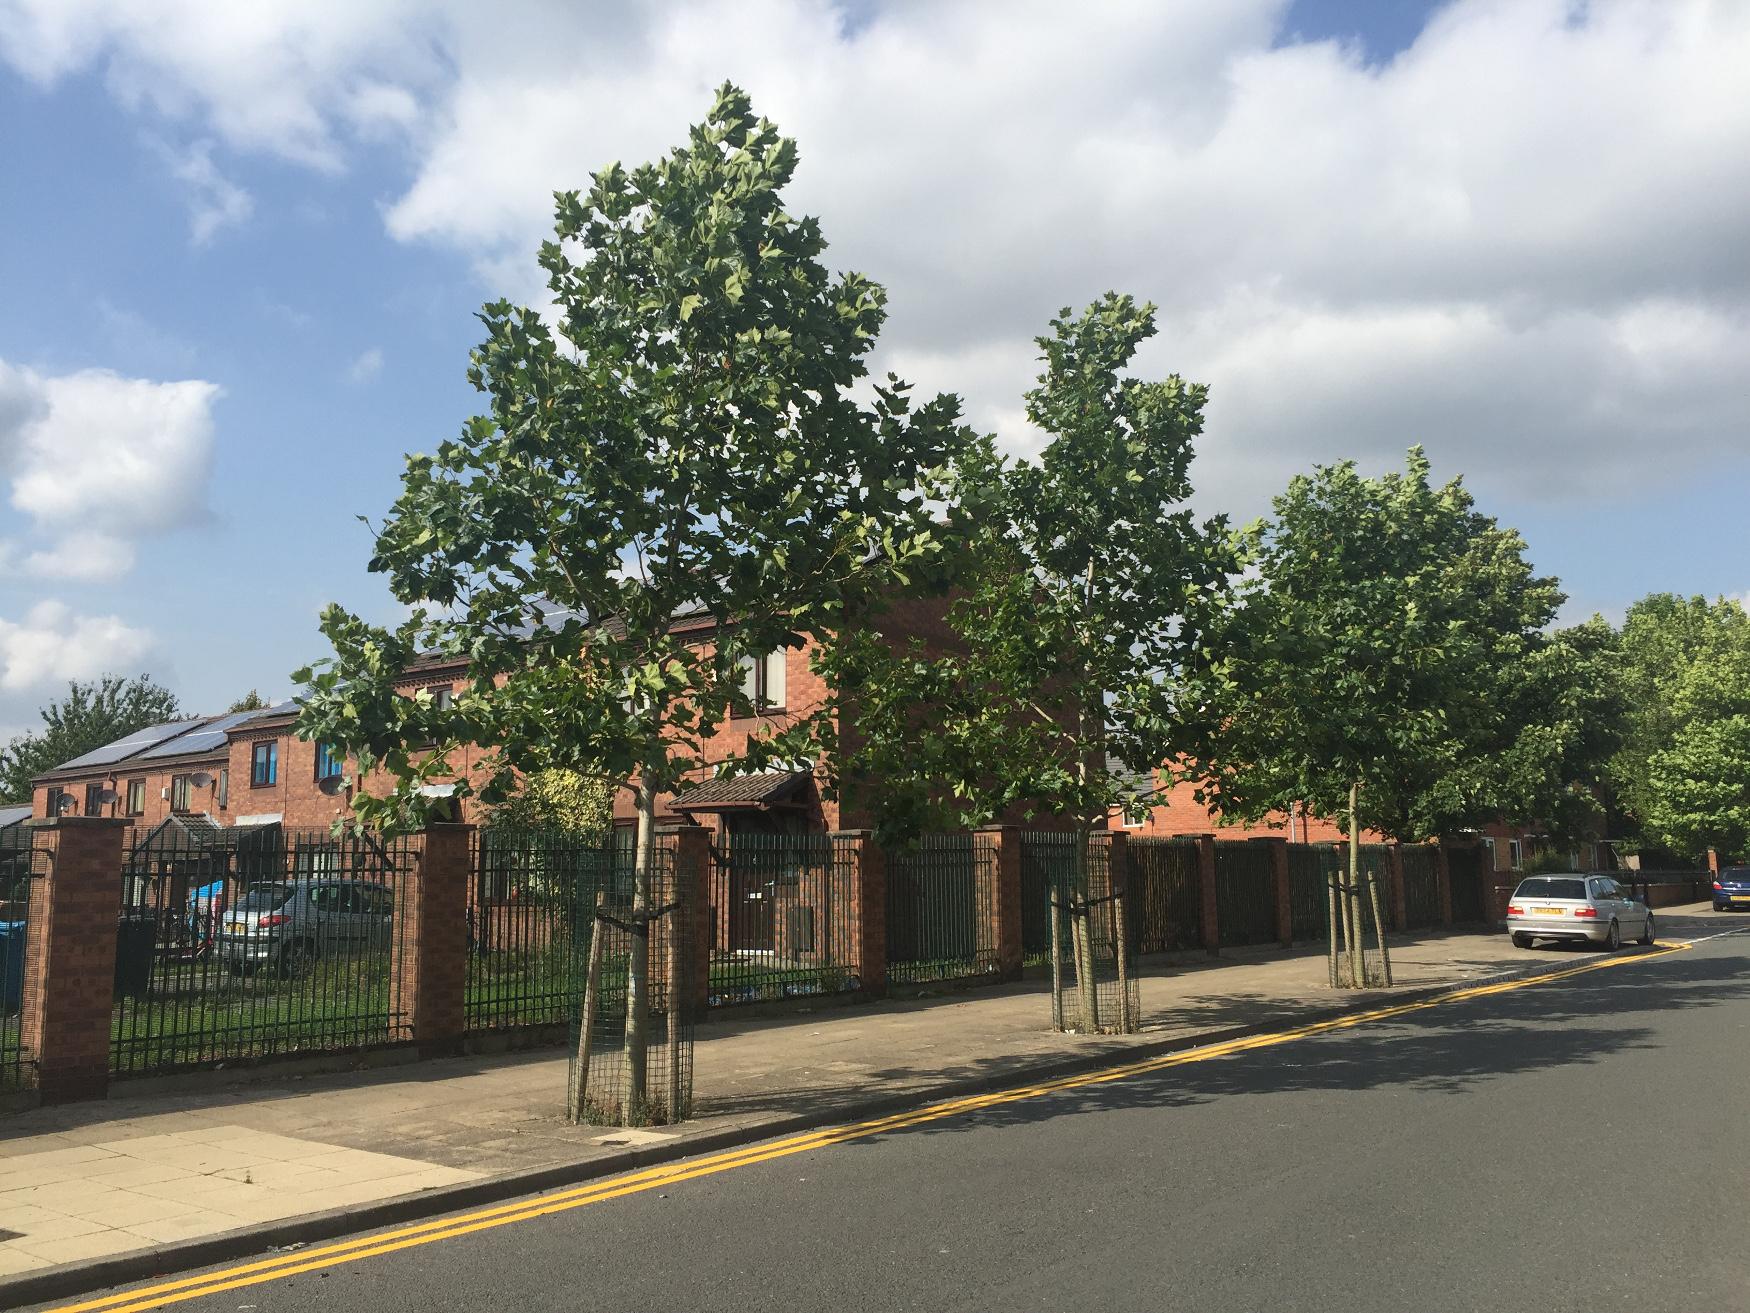 Howard Street trees in 2016